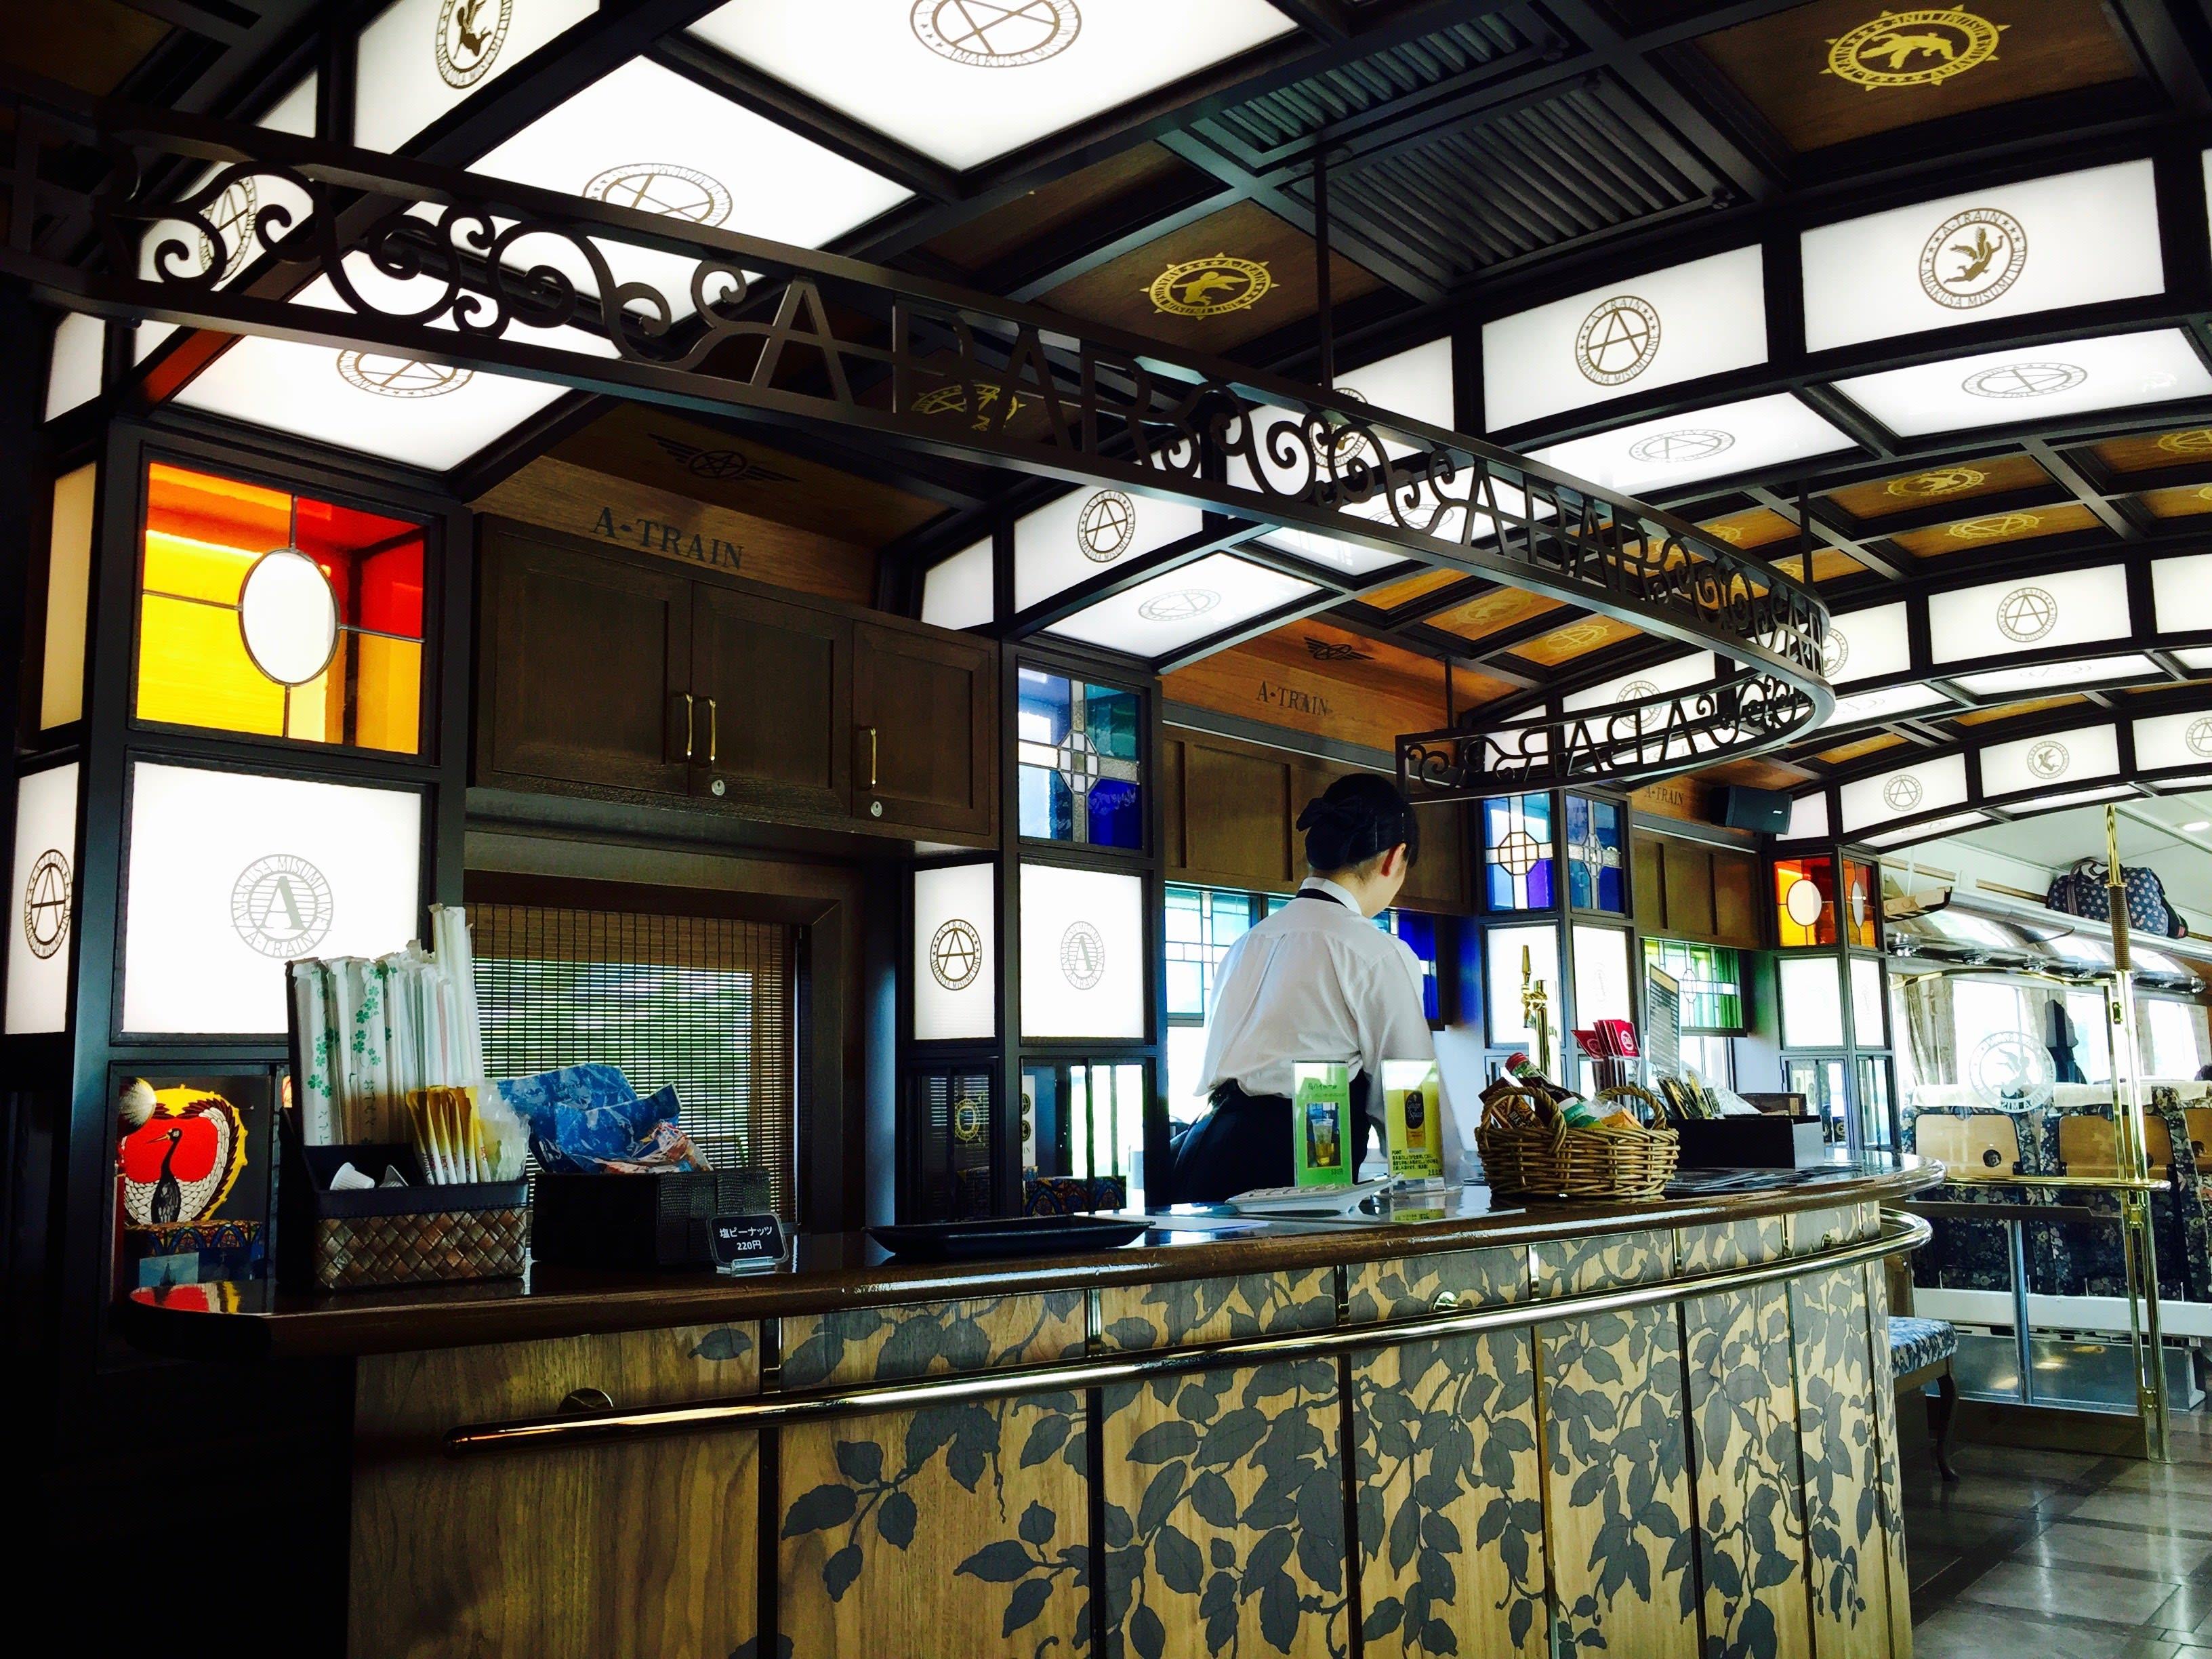 A-Train列車內部竟然有酒吧。Photo|Zach